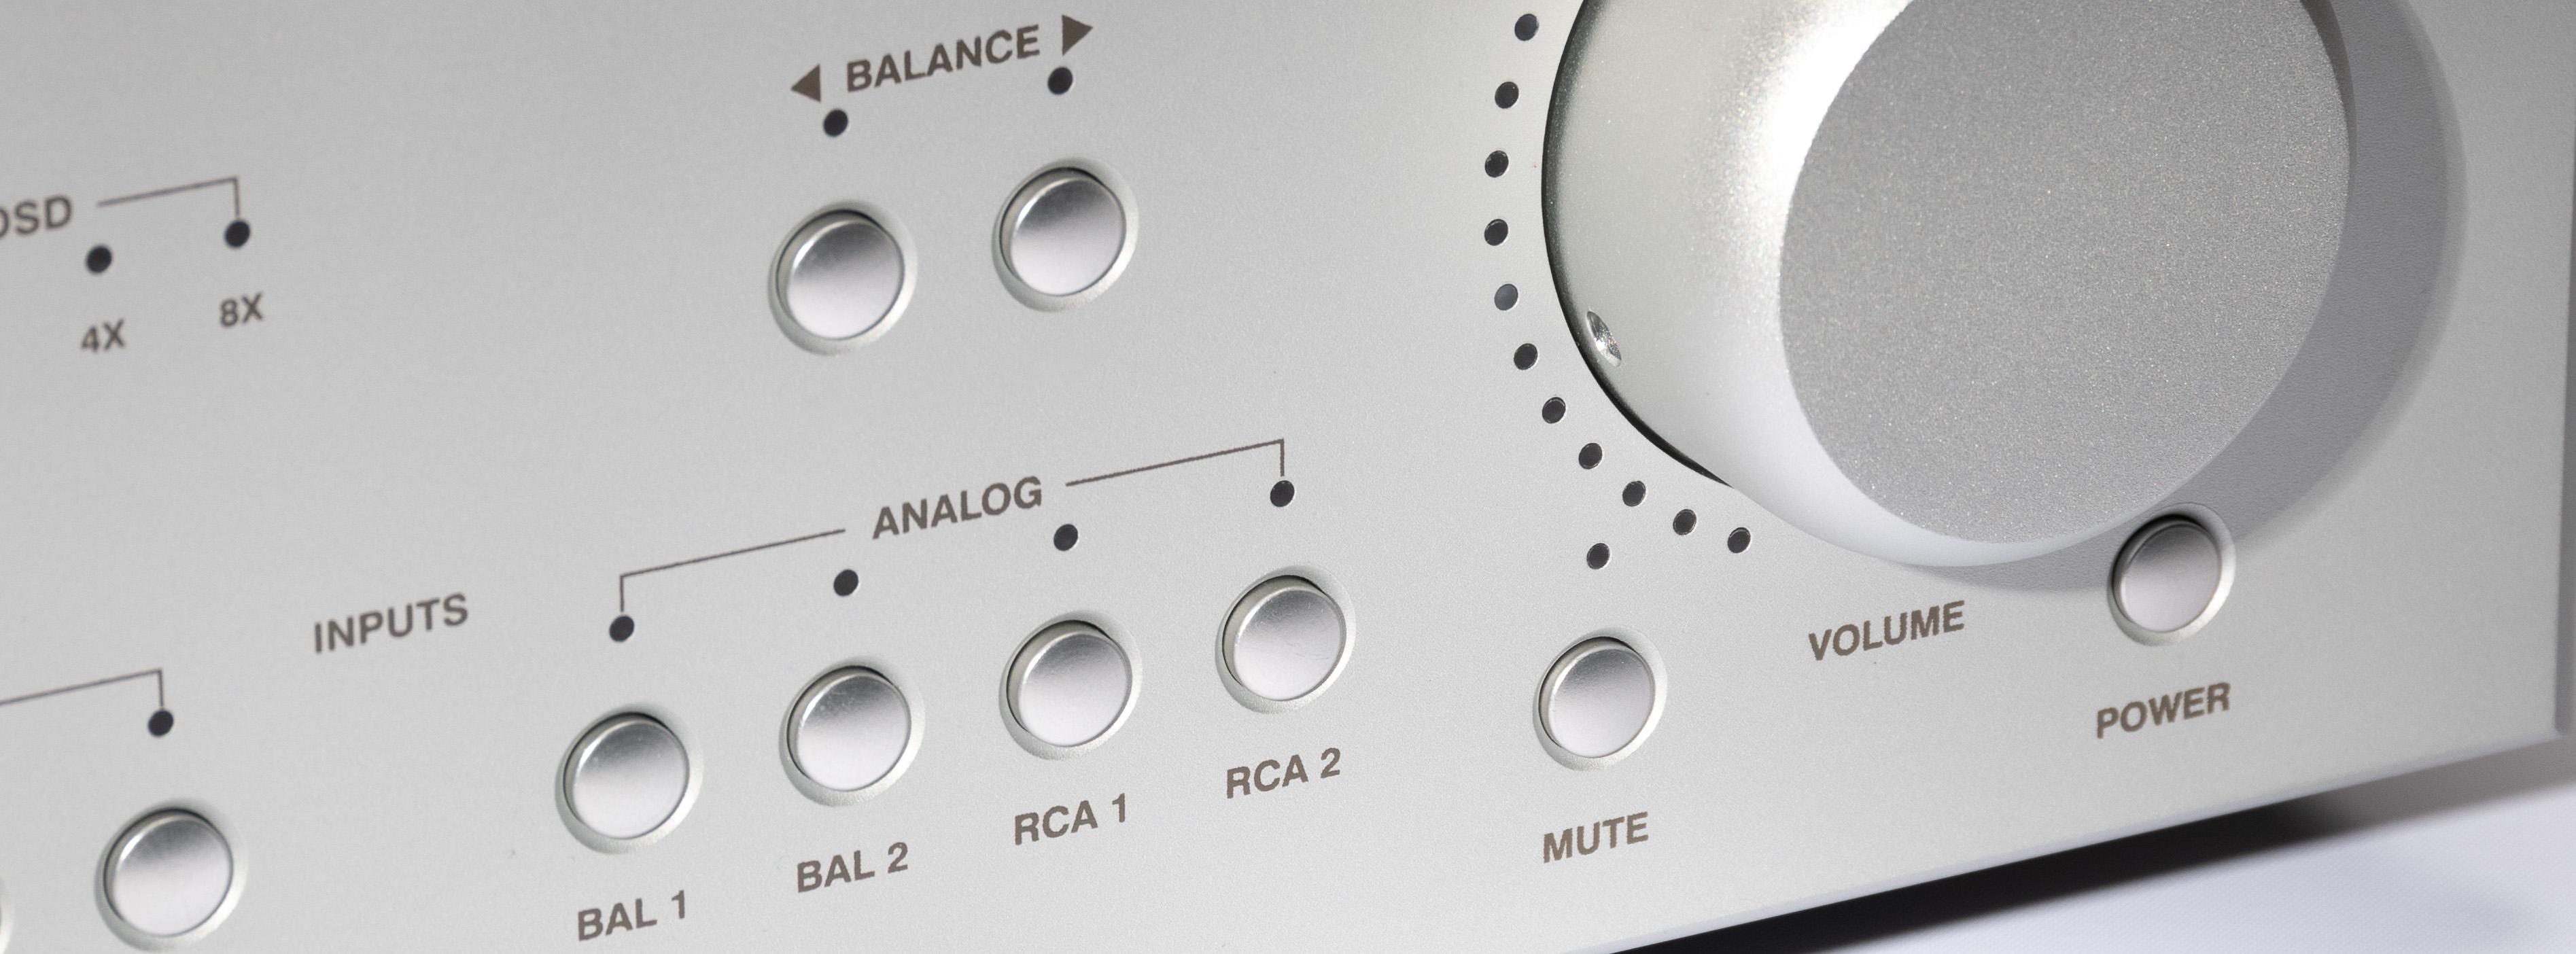 4-analog-inputs-edited-banner.jpg